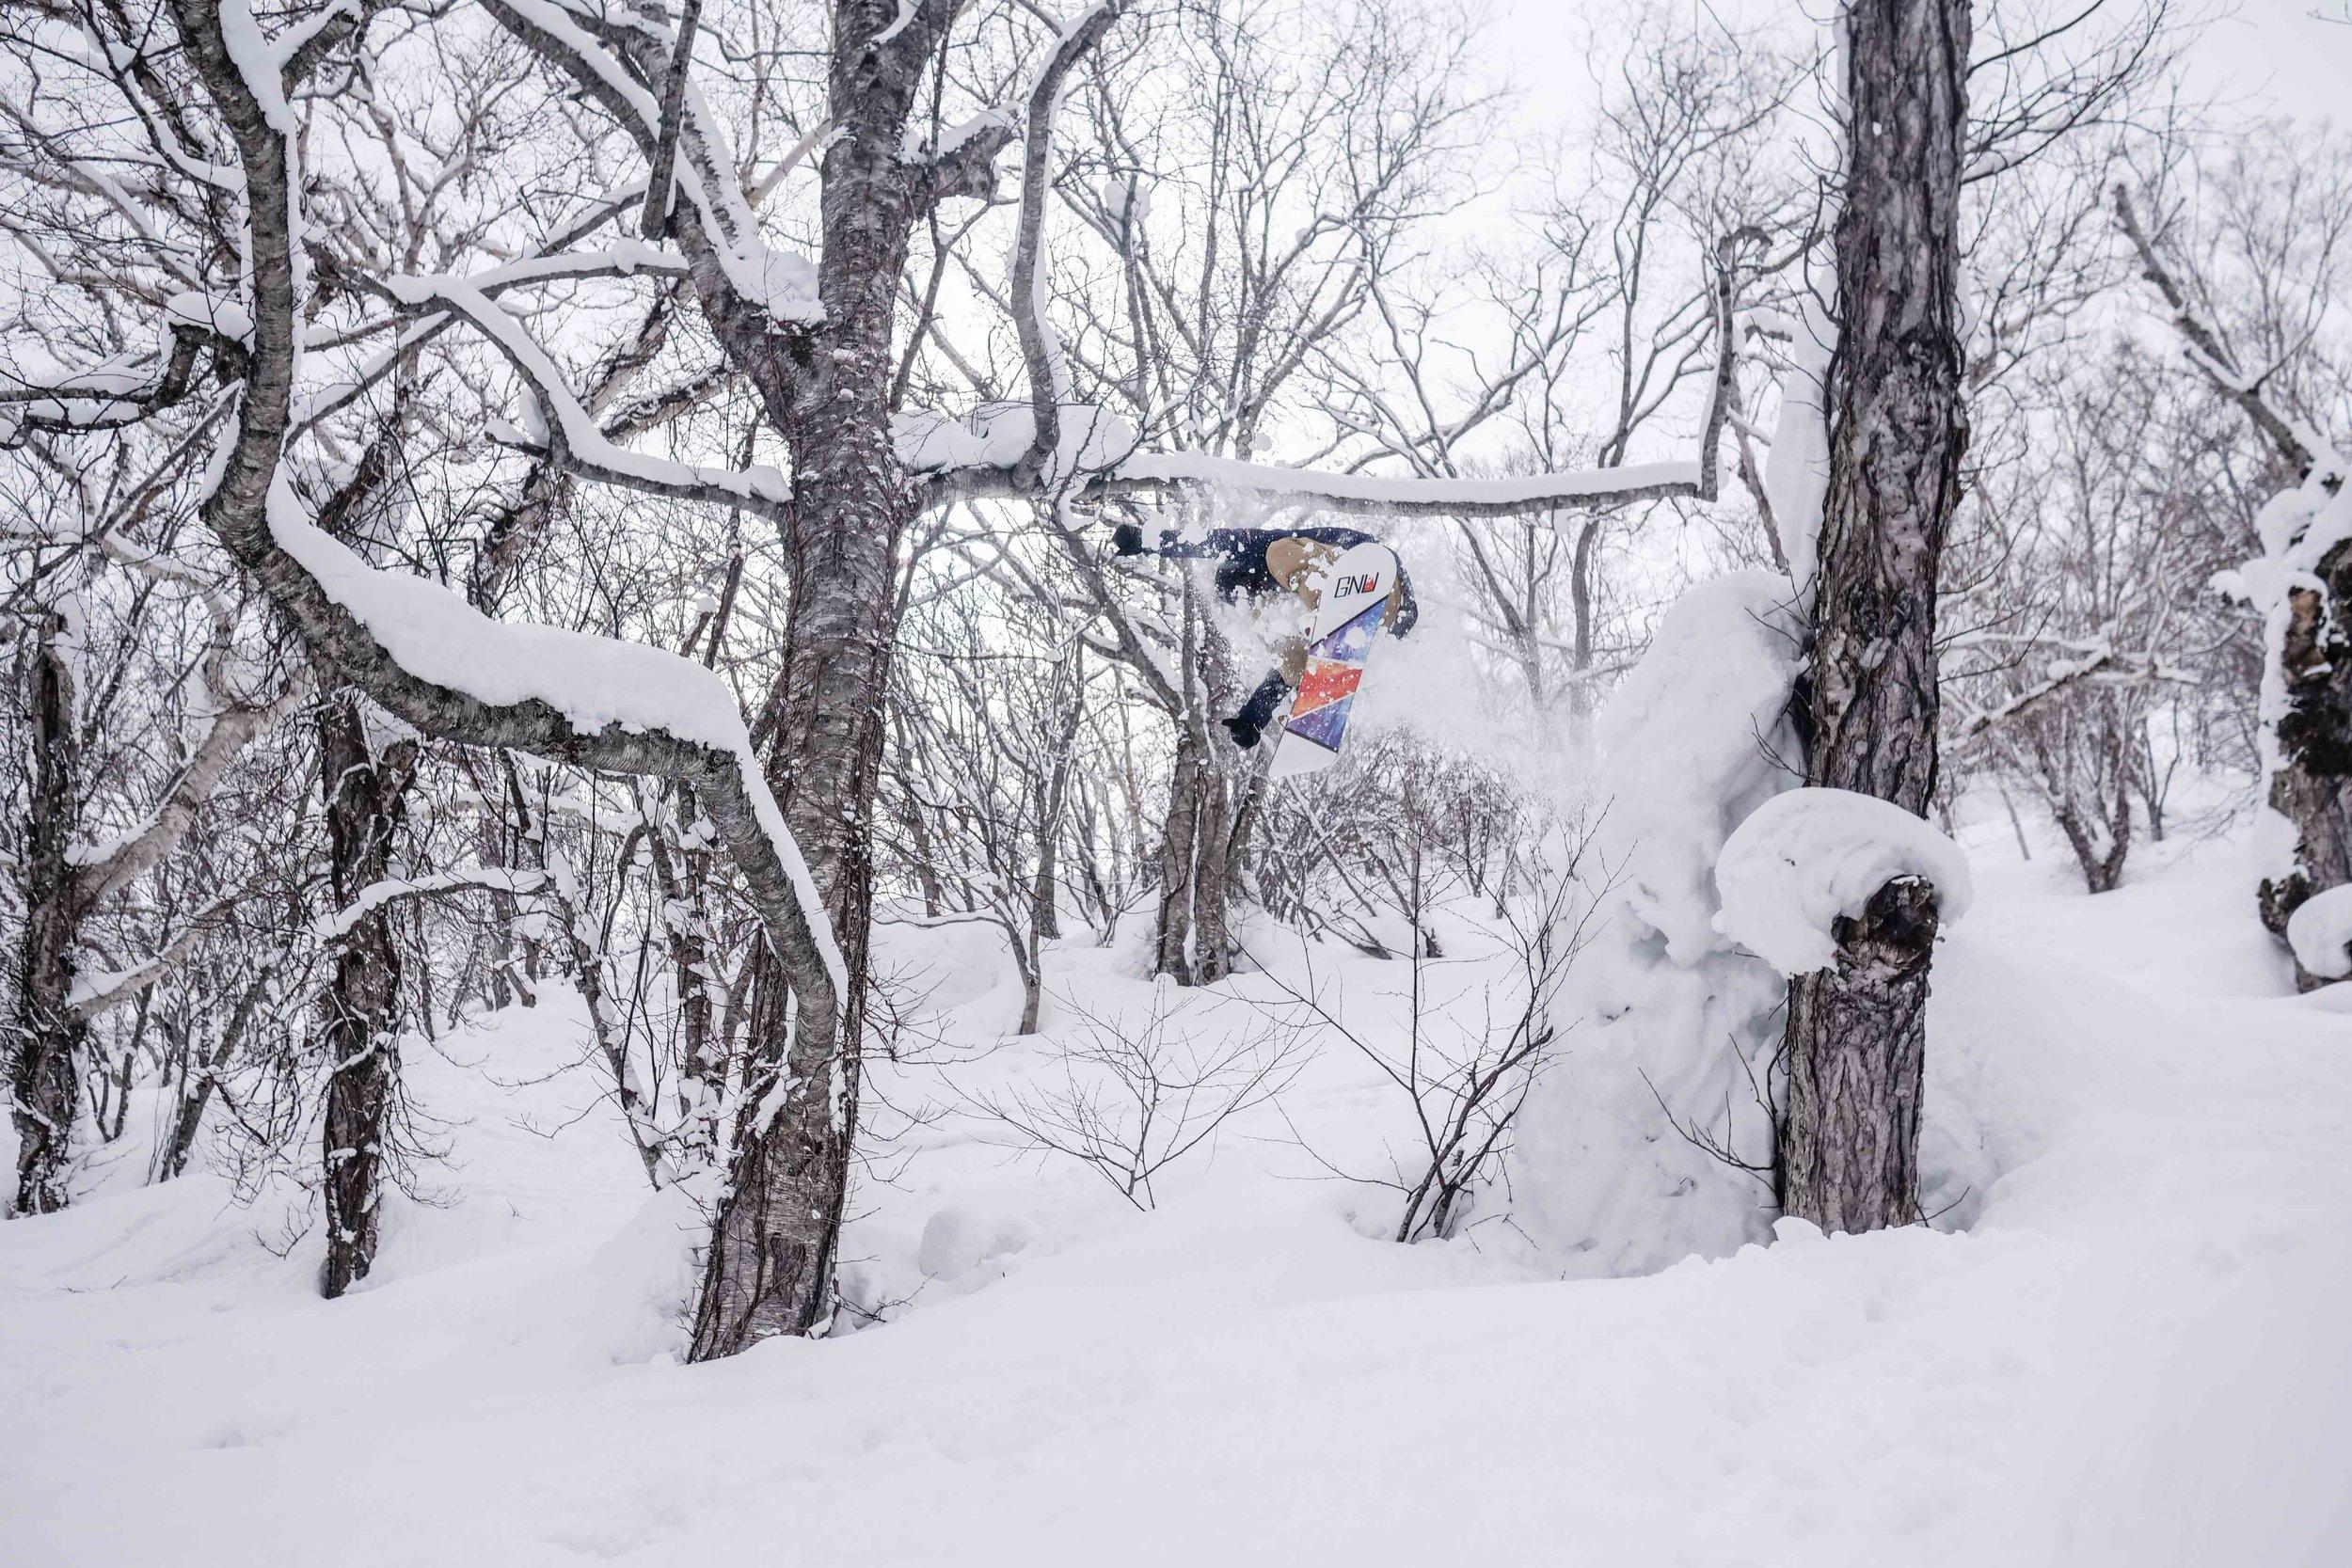 BPRSNT KJERSTI BUAAS SNOWBOARDING JAPAN POWDER 1jpg.jpg